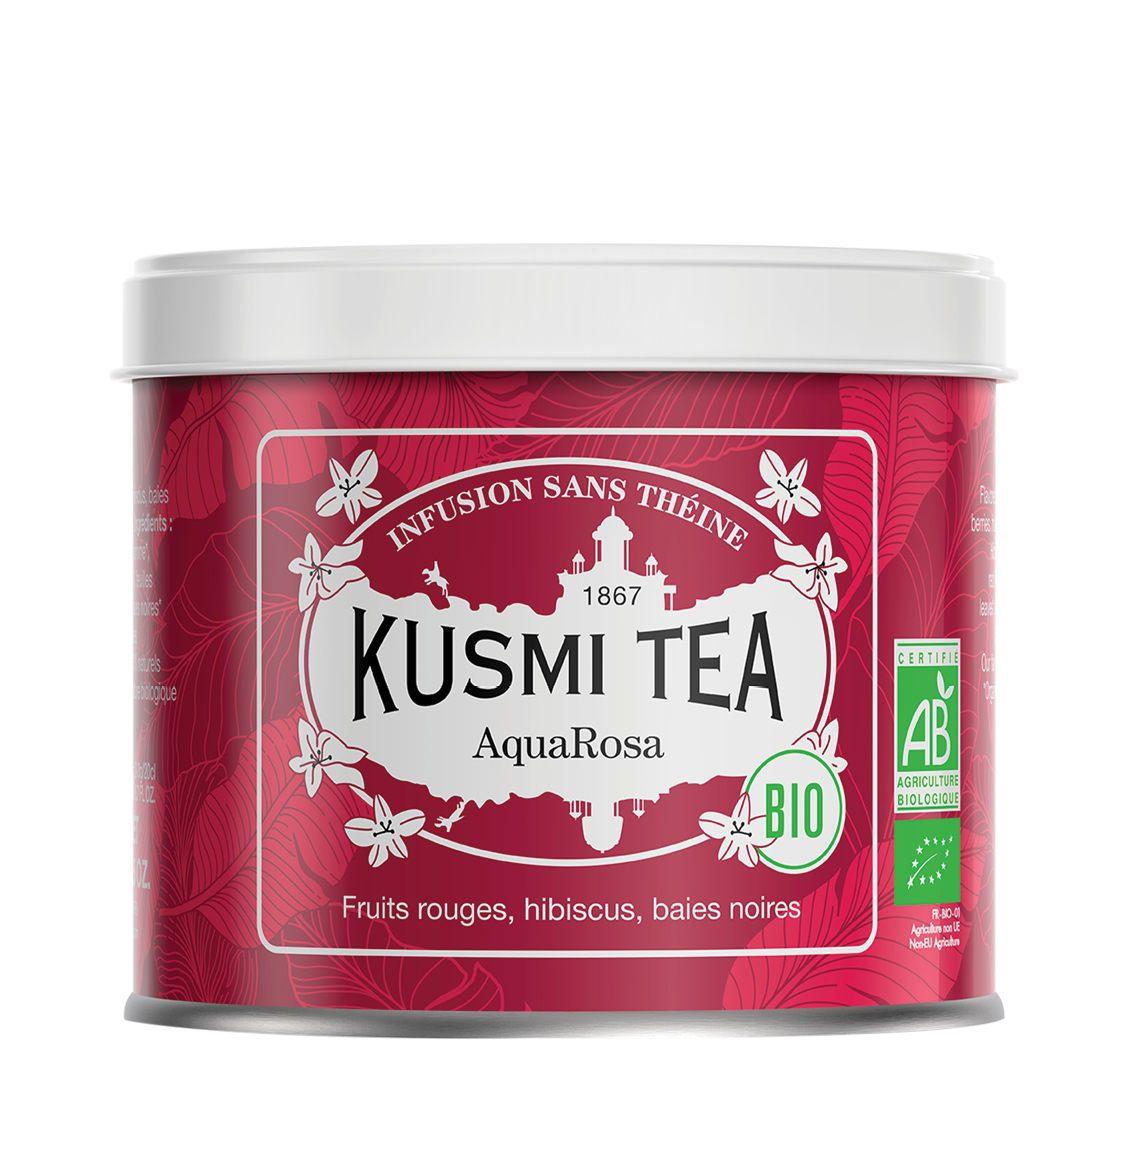 Kusmi Organic AquaRosa Loose Tea BIO 100g